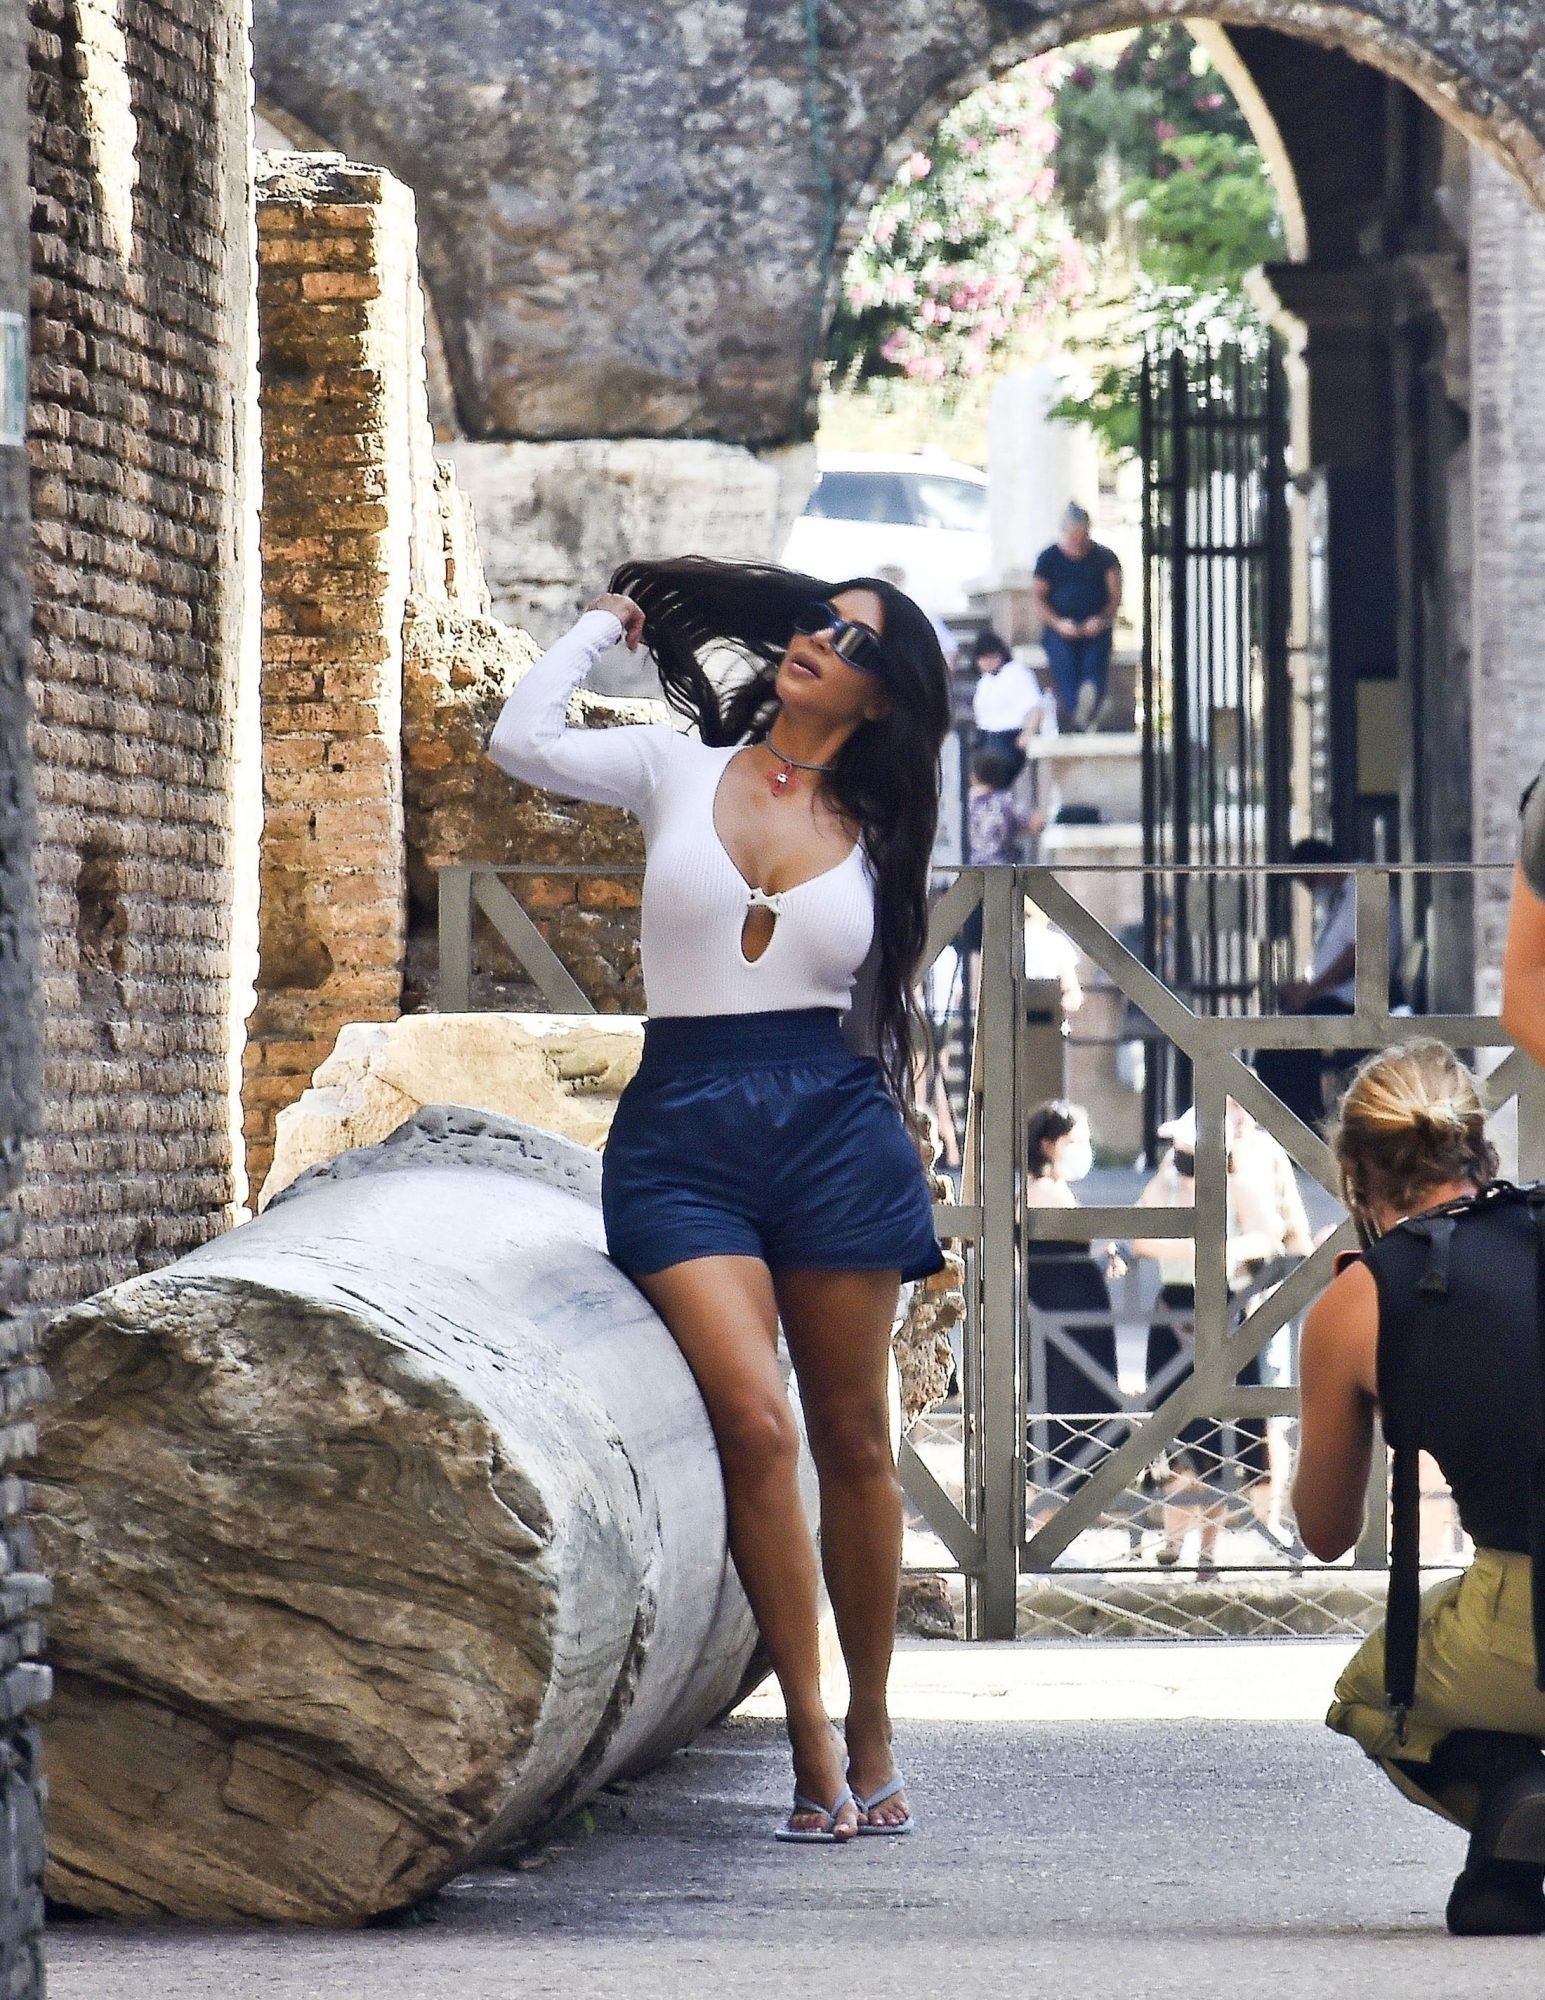 Kim Kardashian Shows Off her Legs in Rome